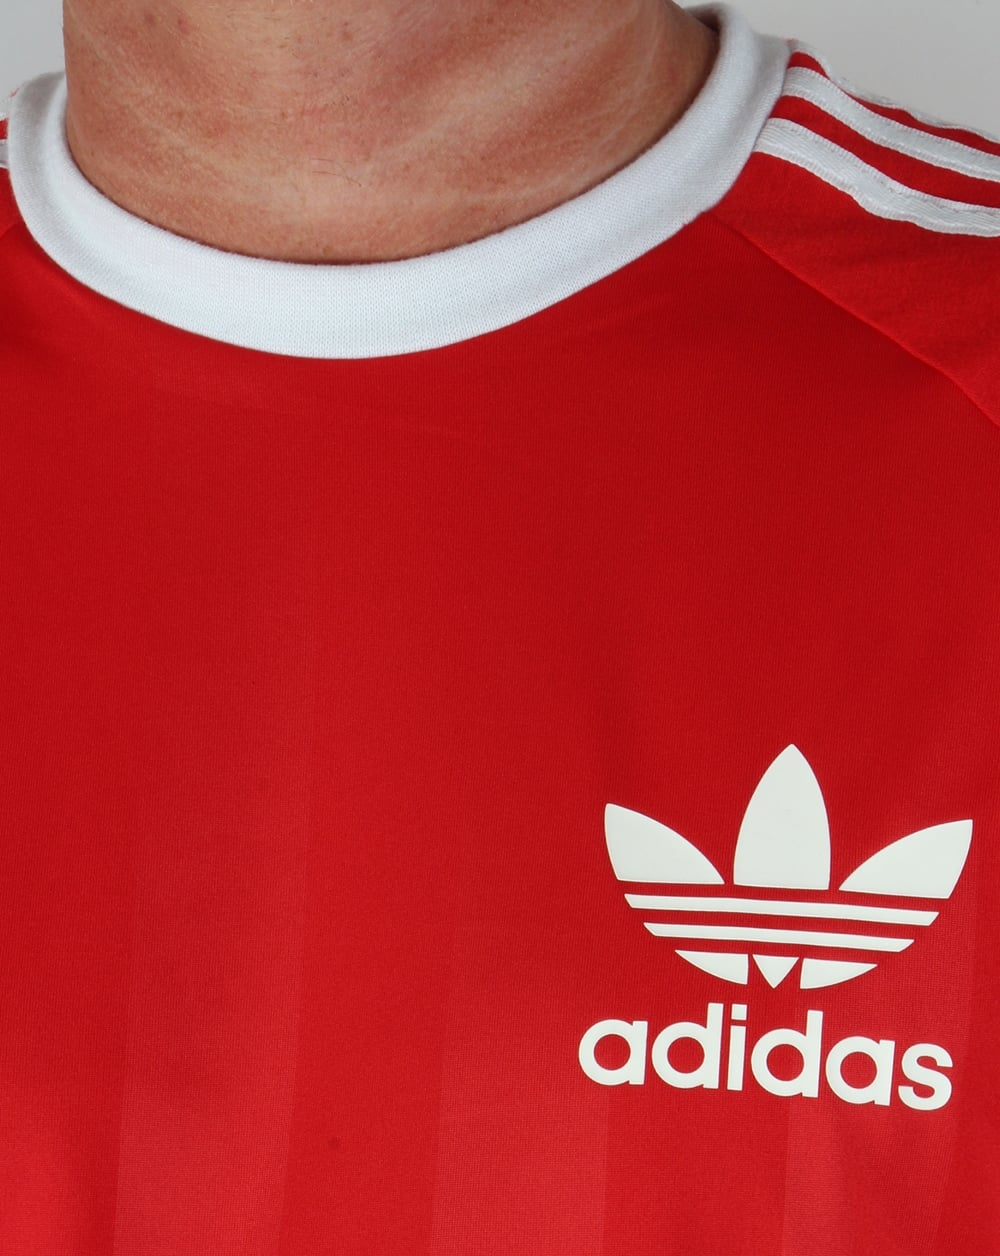 e8ad17b56 Adidas Retro Old Skool Ringer T-shirt in Red, football, california